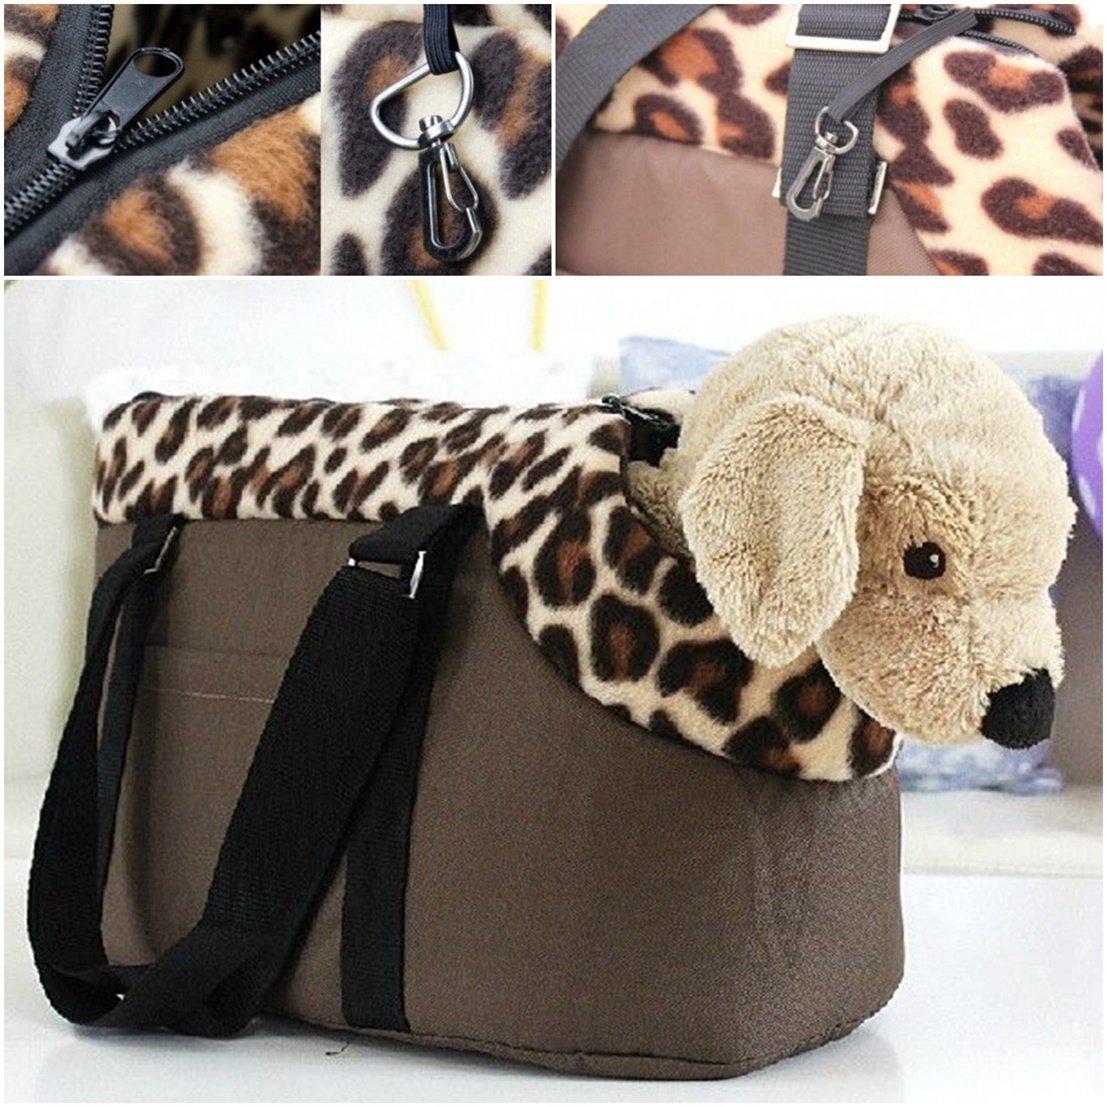 First-class Popular Pet Handbag Size L Dog Portable Travel Carrier Cat Nesting Color Coffee Leopard